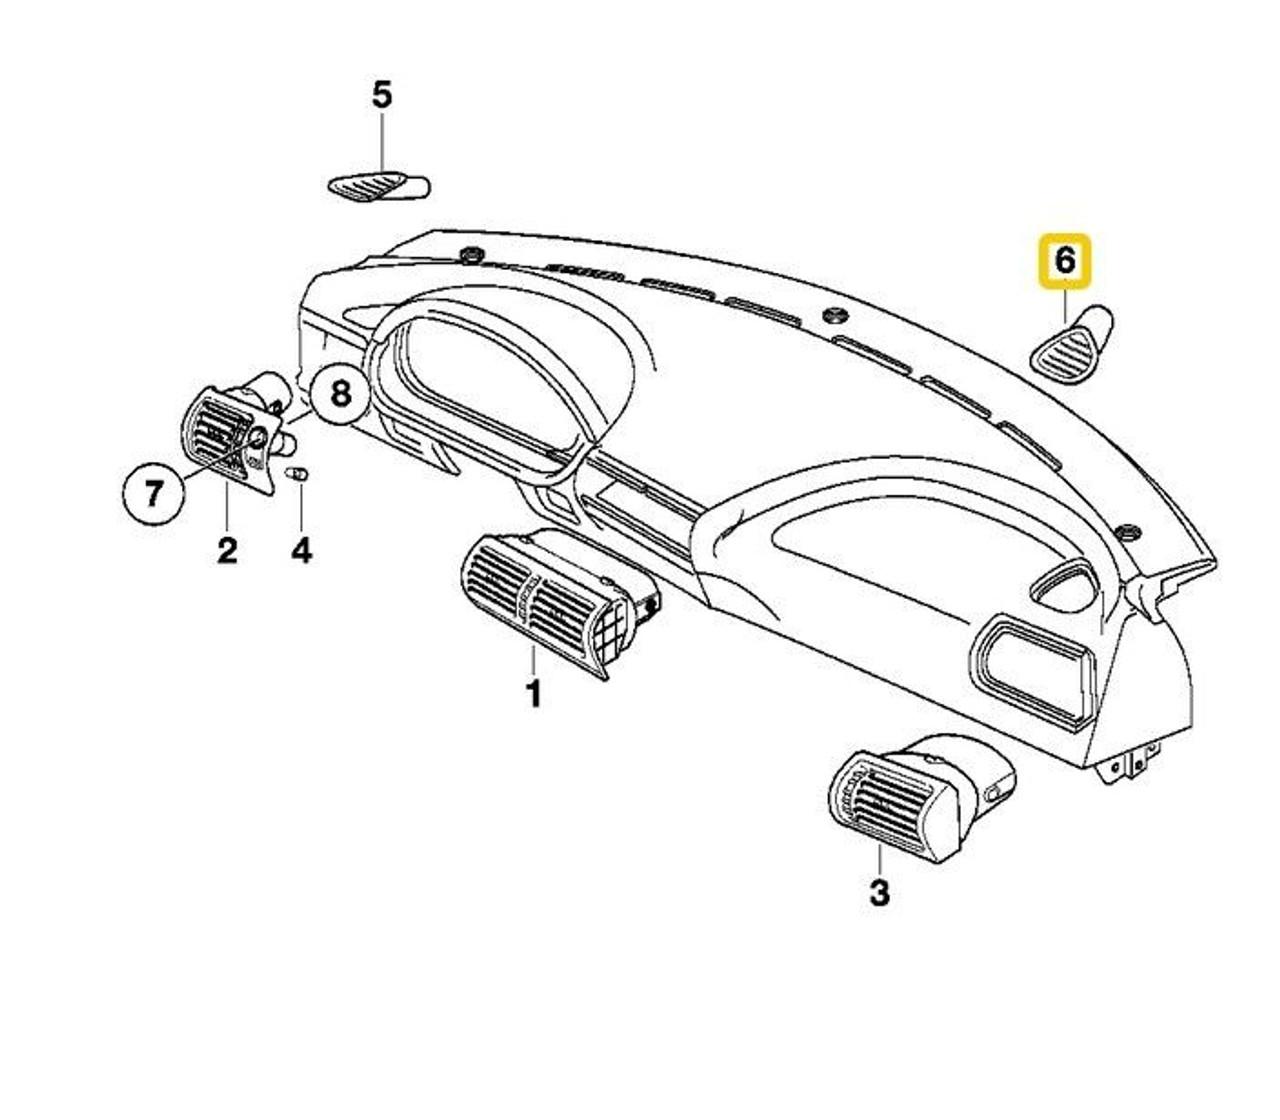 hight resolution of genuine bmw z3 instrument panel beige defroster nozzle right 96 02 64228399938 theis motorsport